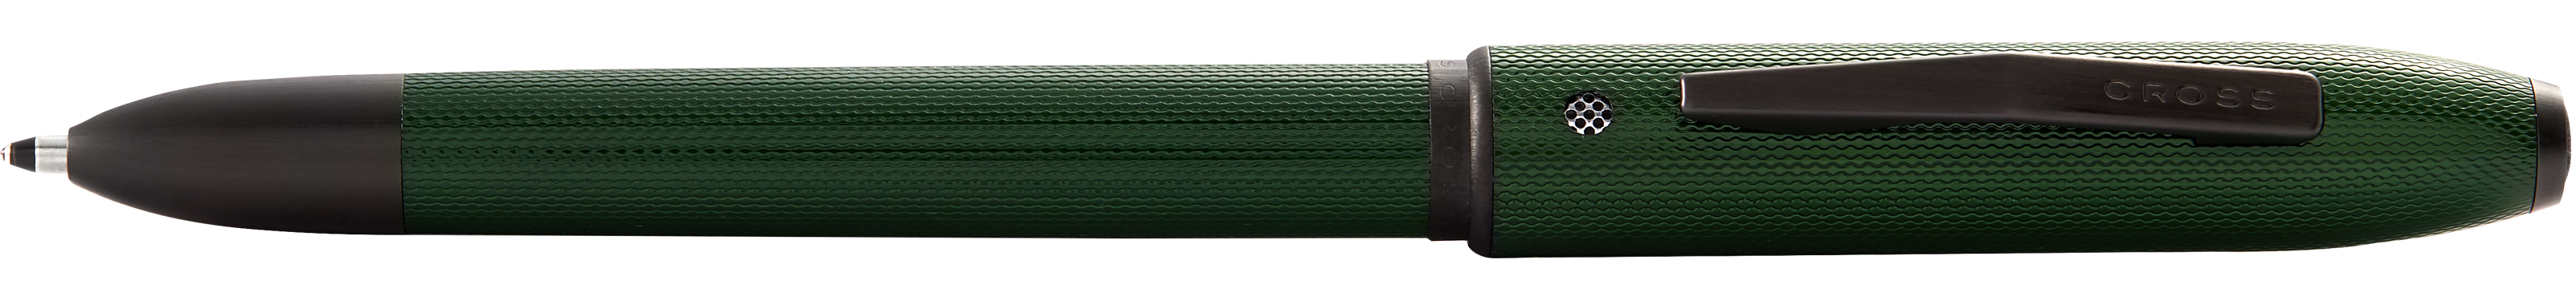 Tech4 Green PVD Multifunction Pen